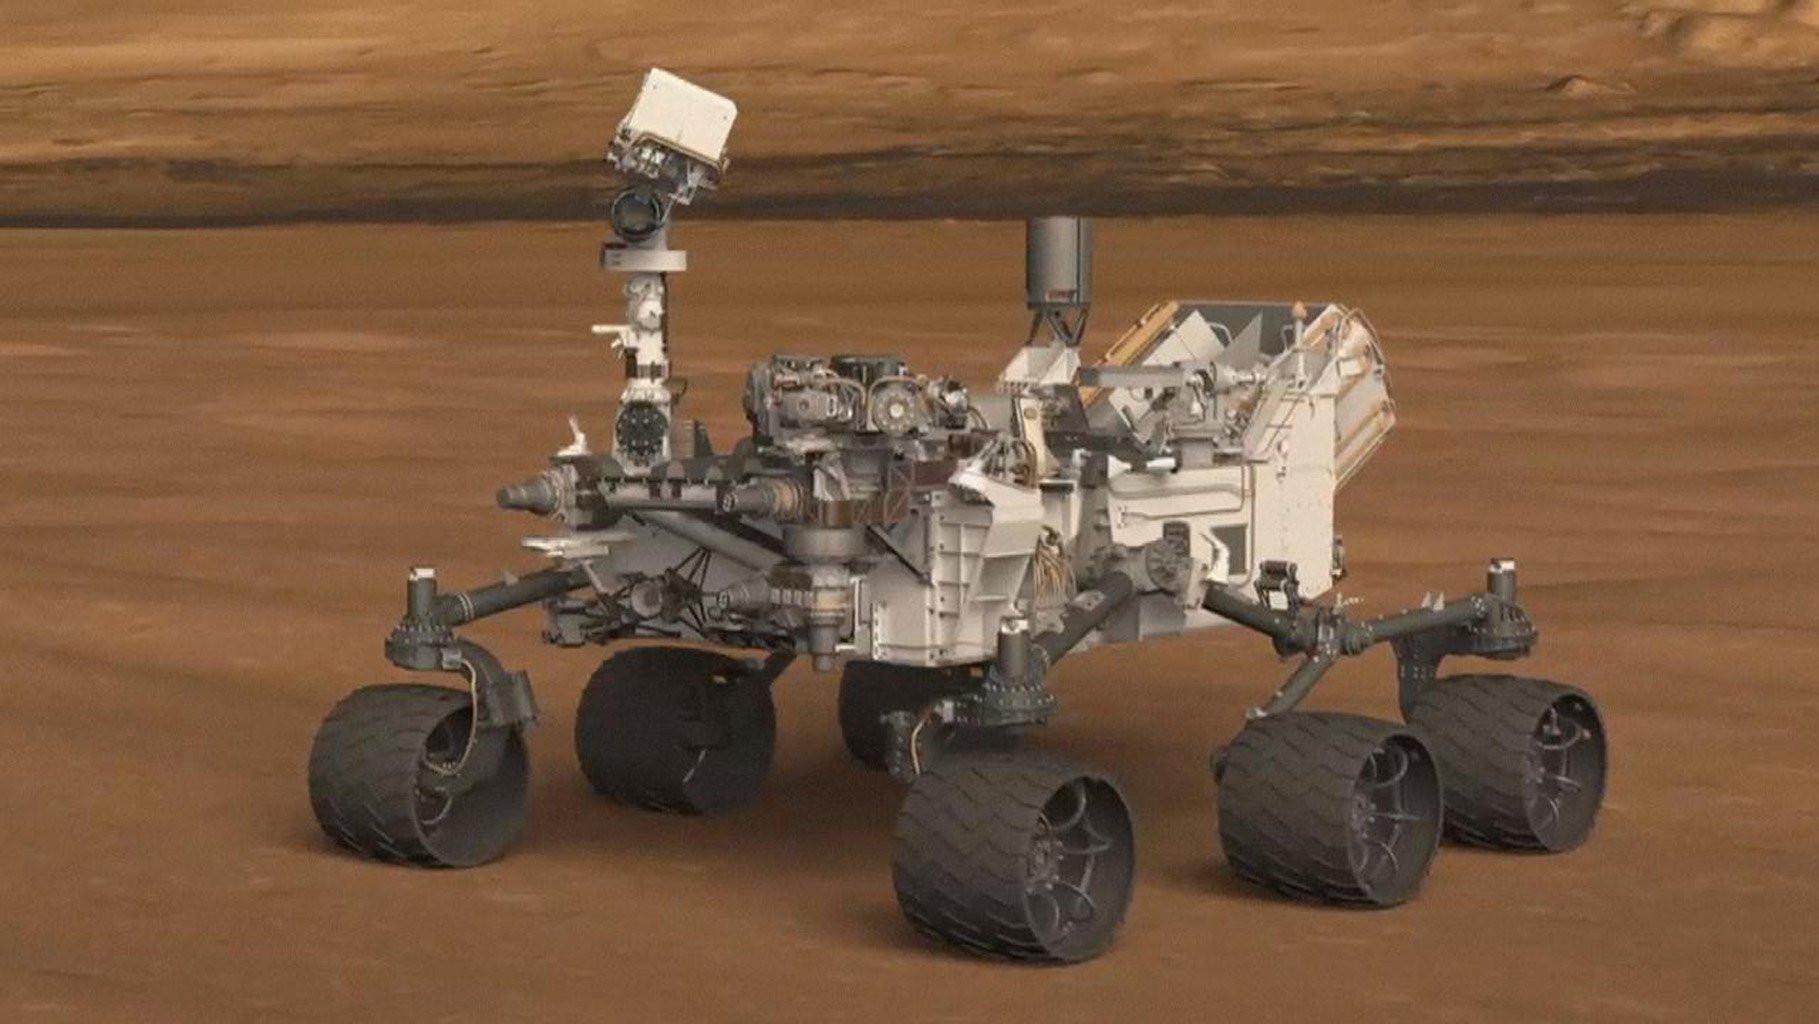 НаМарсе были кислород ивода— Ученые